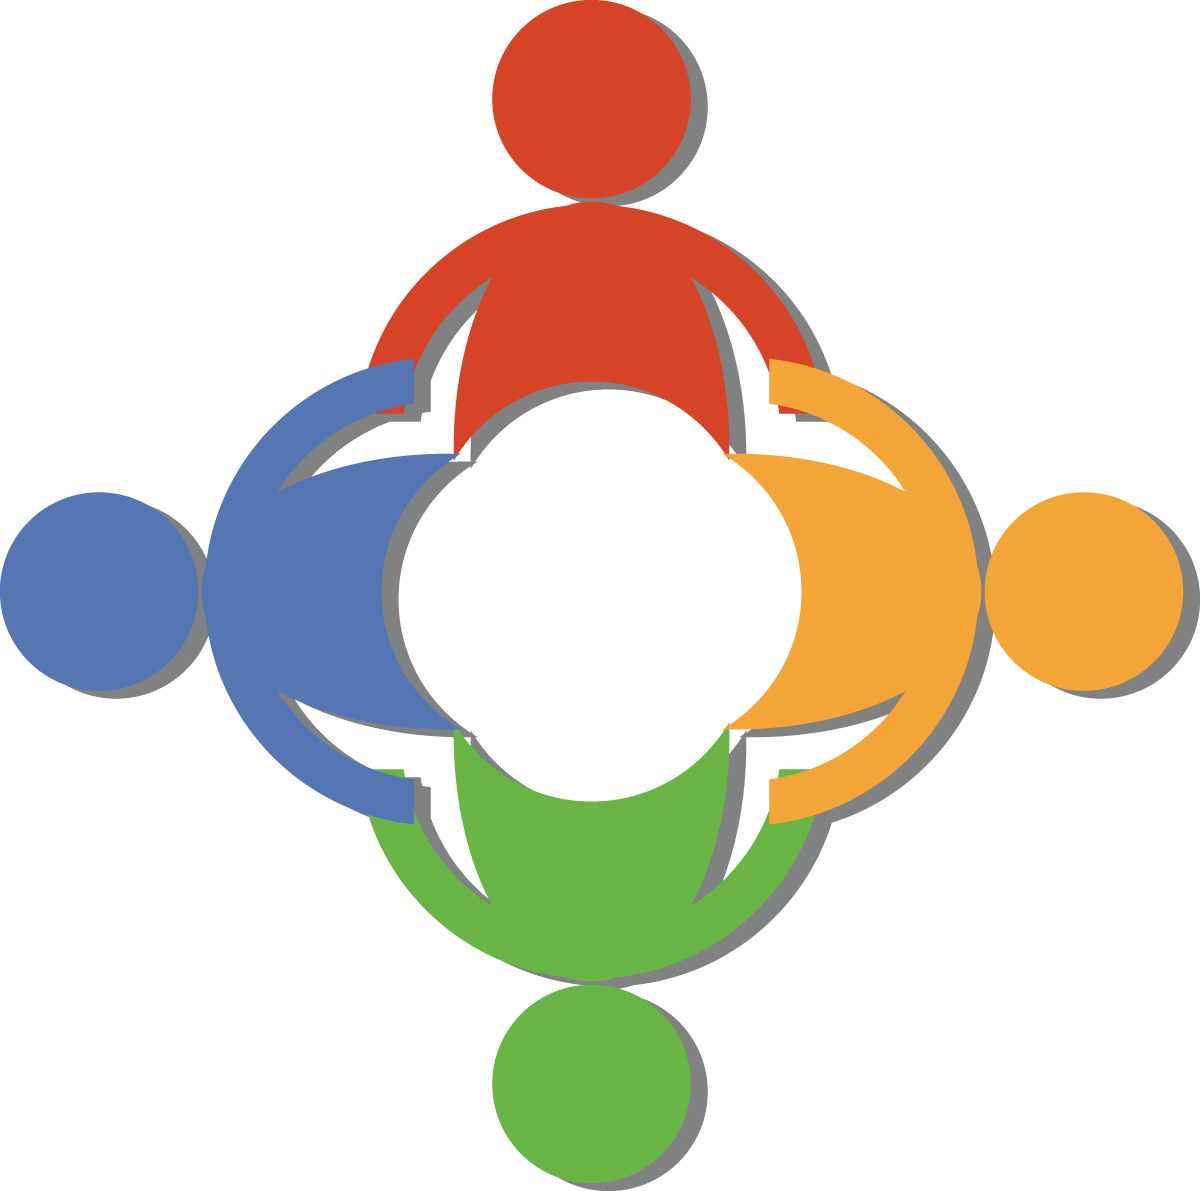 Free Teamwork Clip Art Of A Circle Of Di-Free Teamwork Clip Art Of A Circle Of Diverse People Holding Hands-2